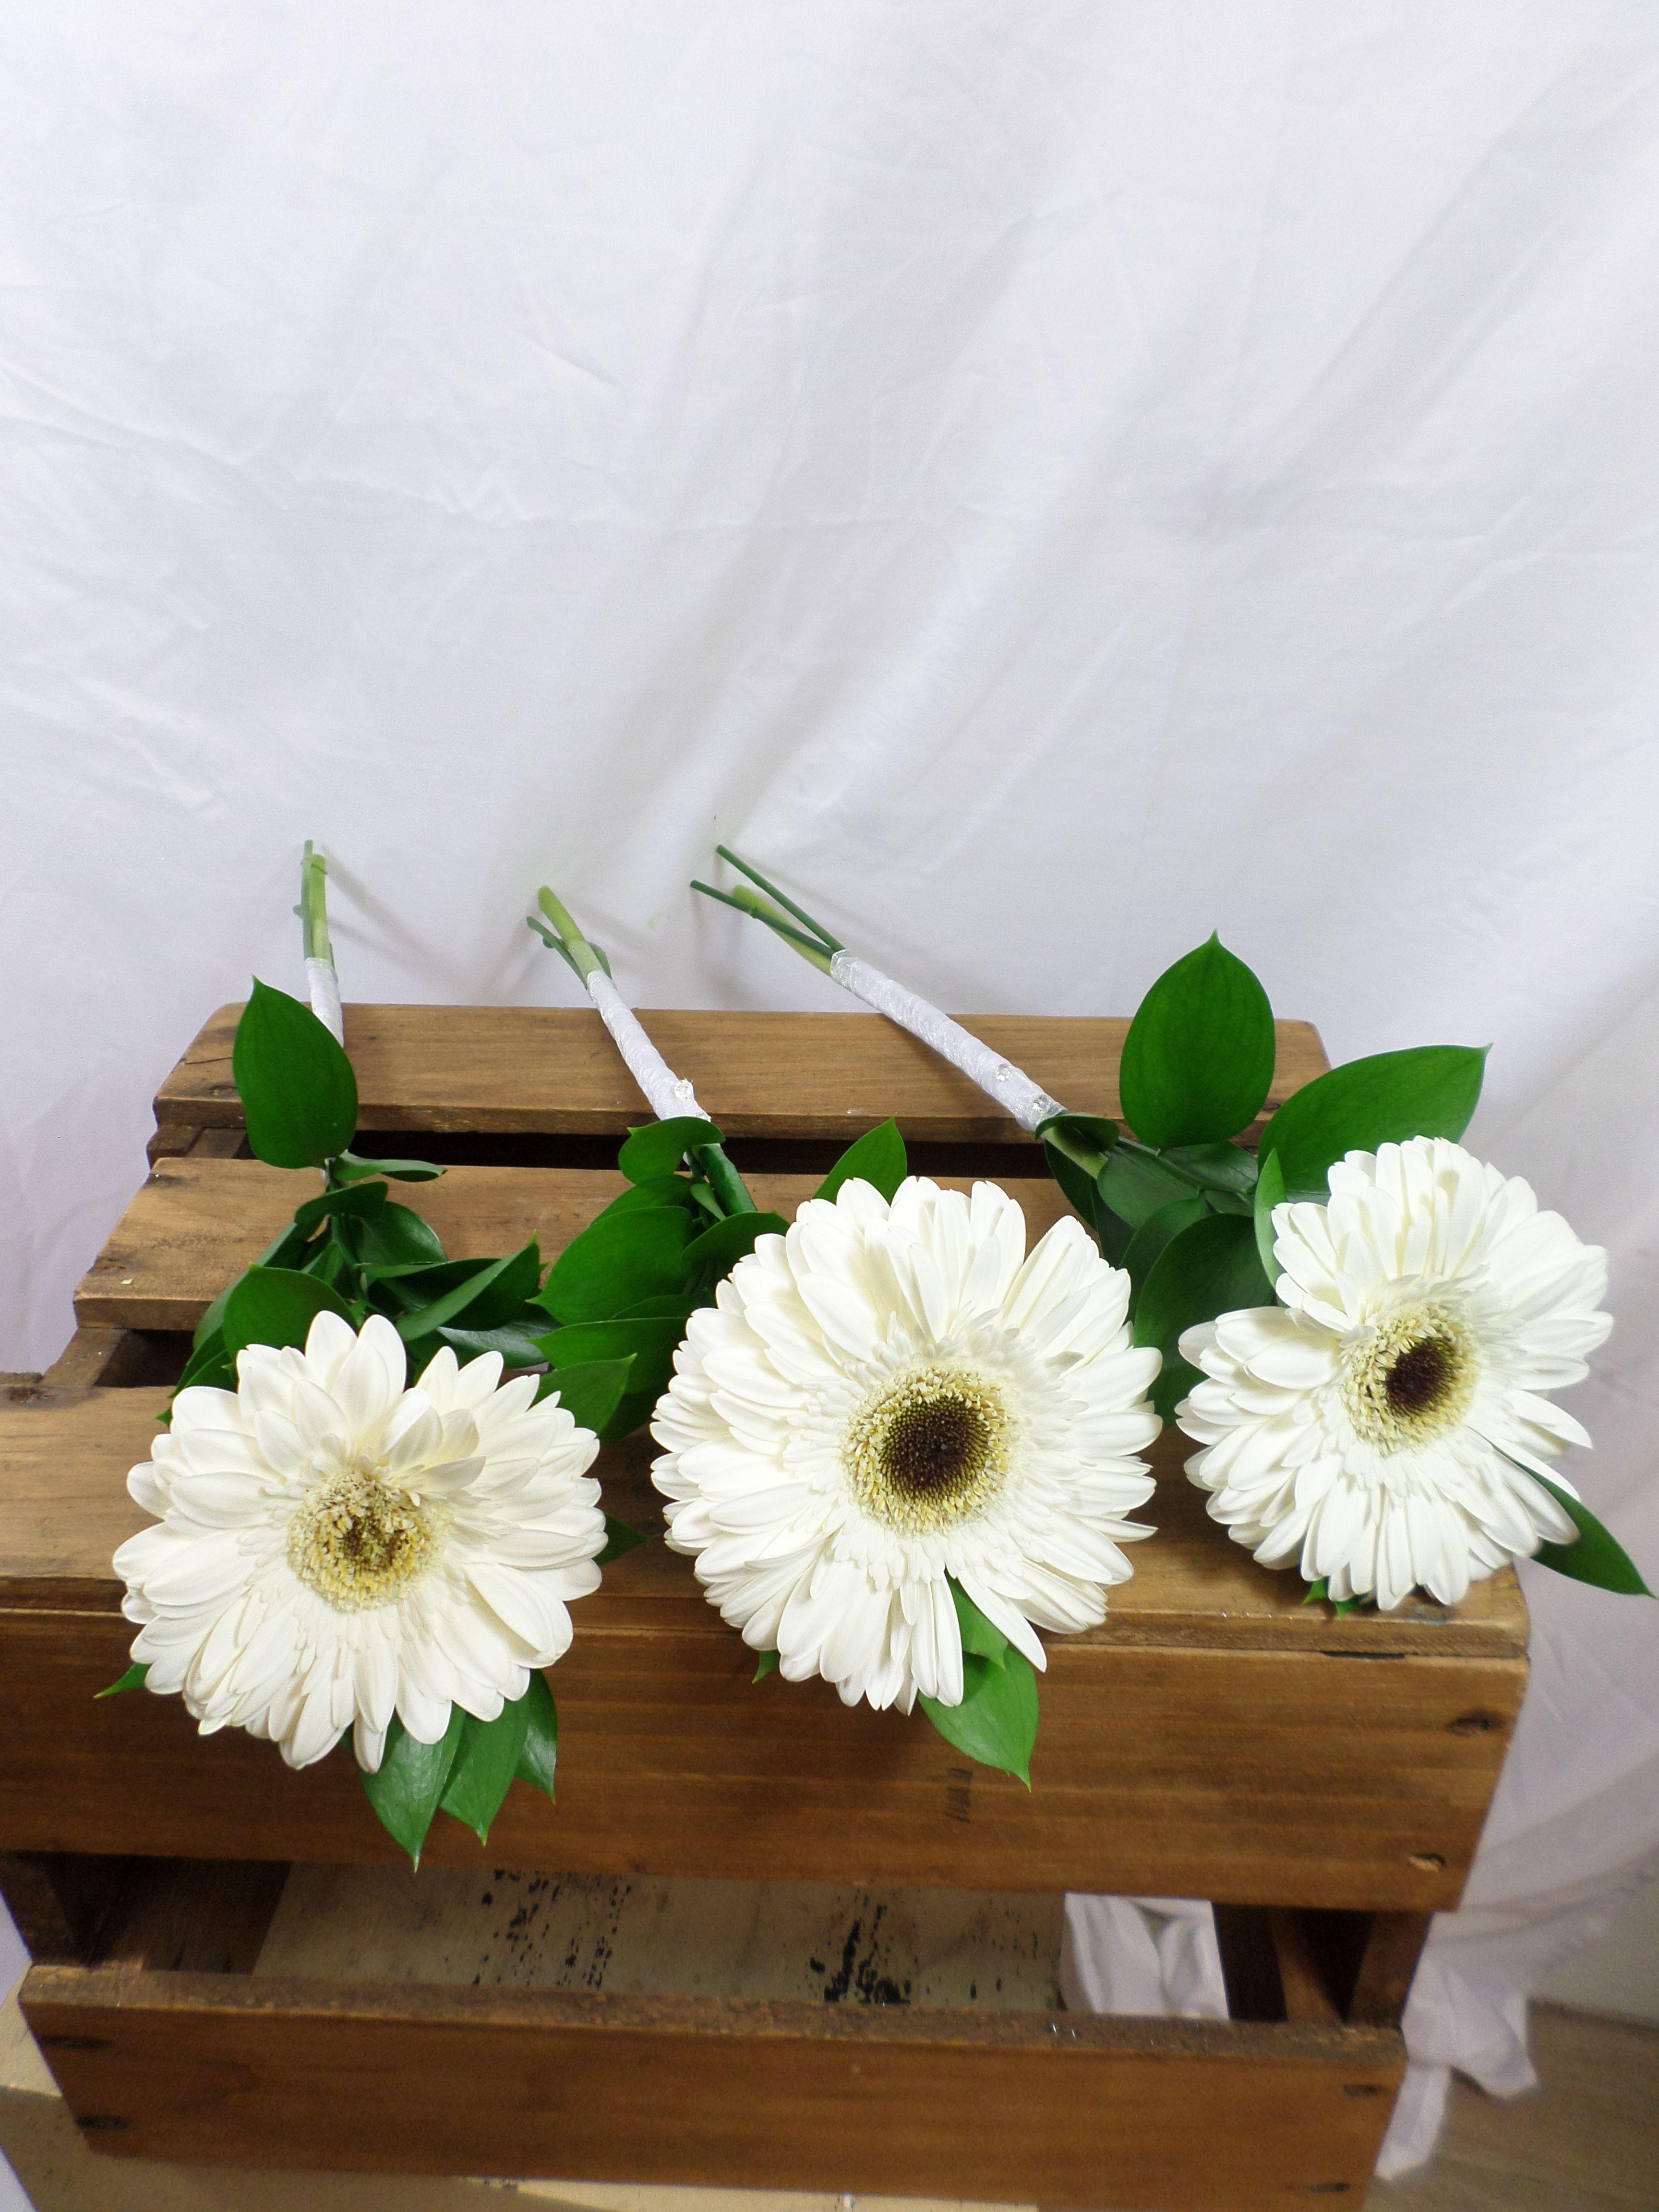 Simple single Gerbera stems with greenery for Bridesmaids. Designed by Florist ilene, Hamilton, NZ